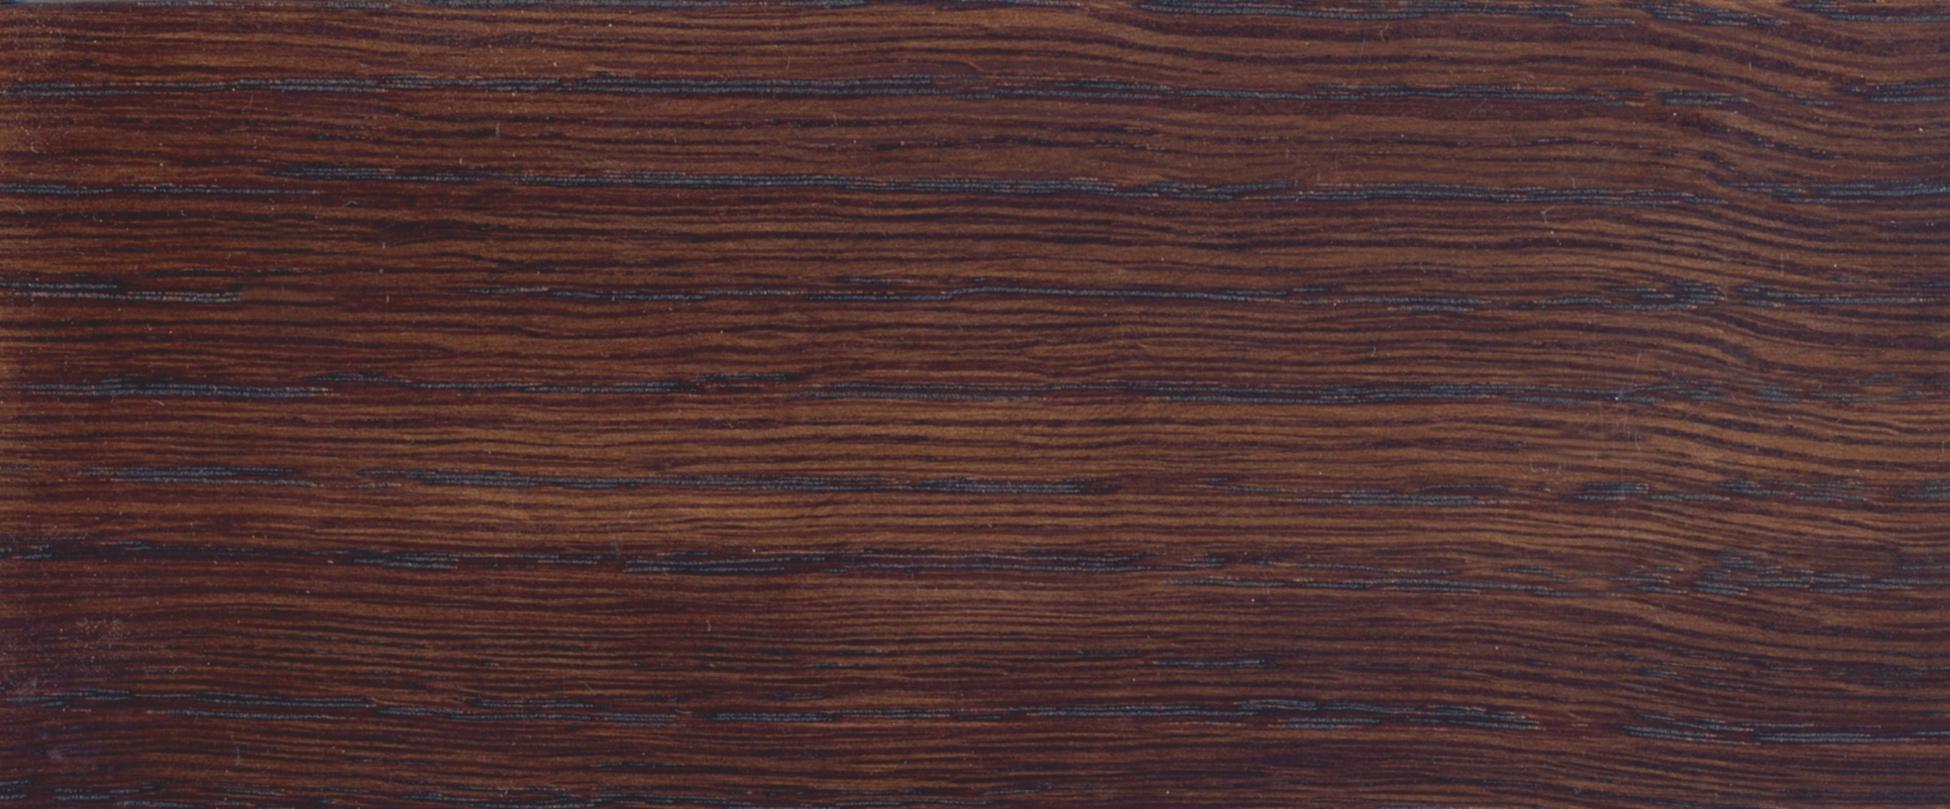 white oak - medium brown